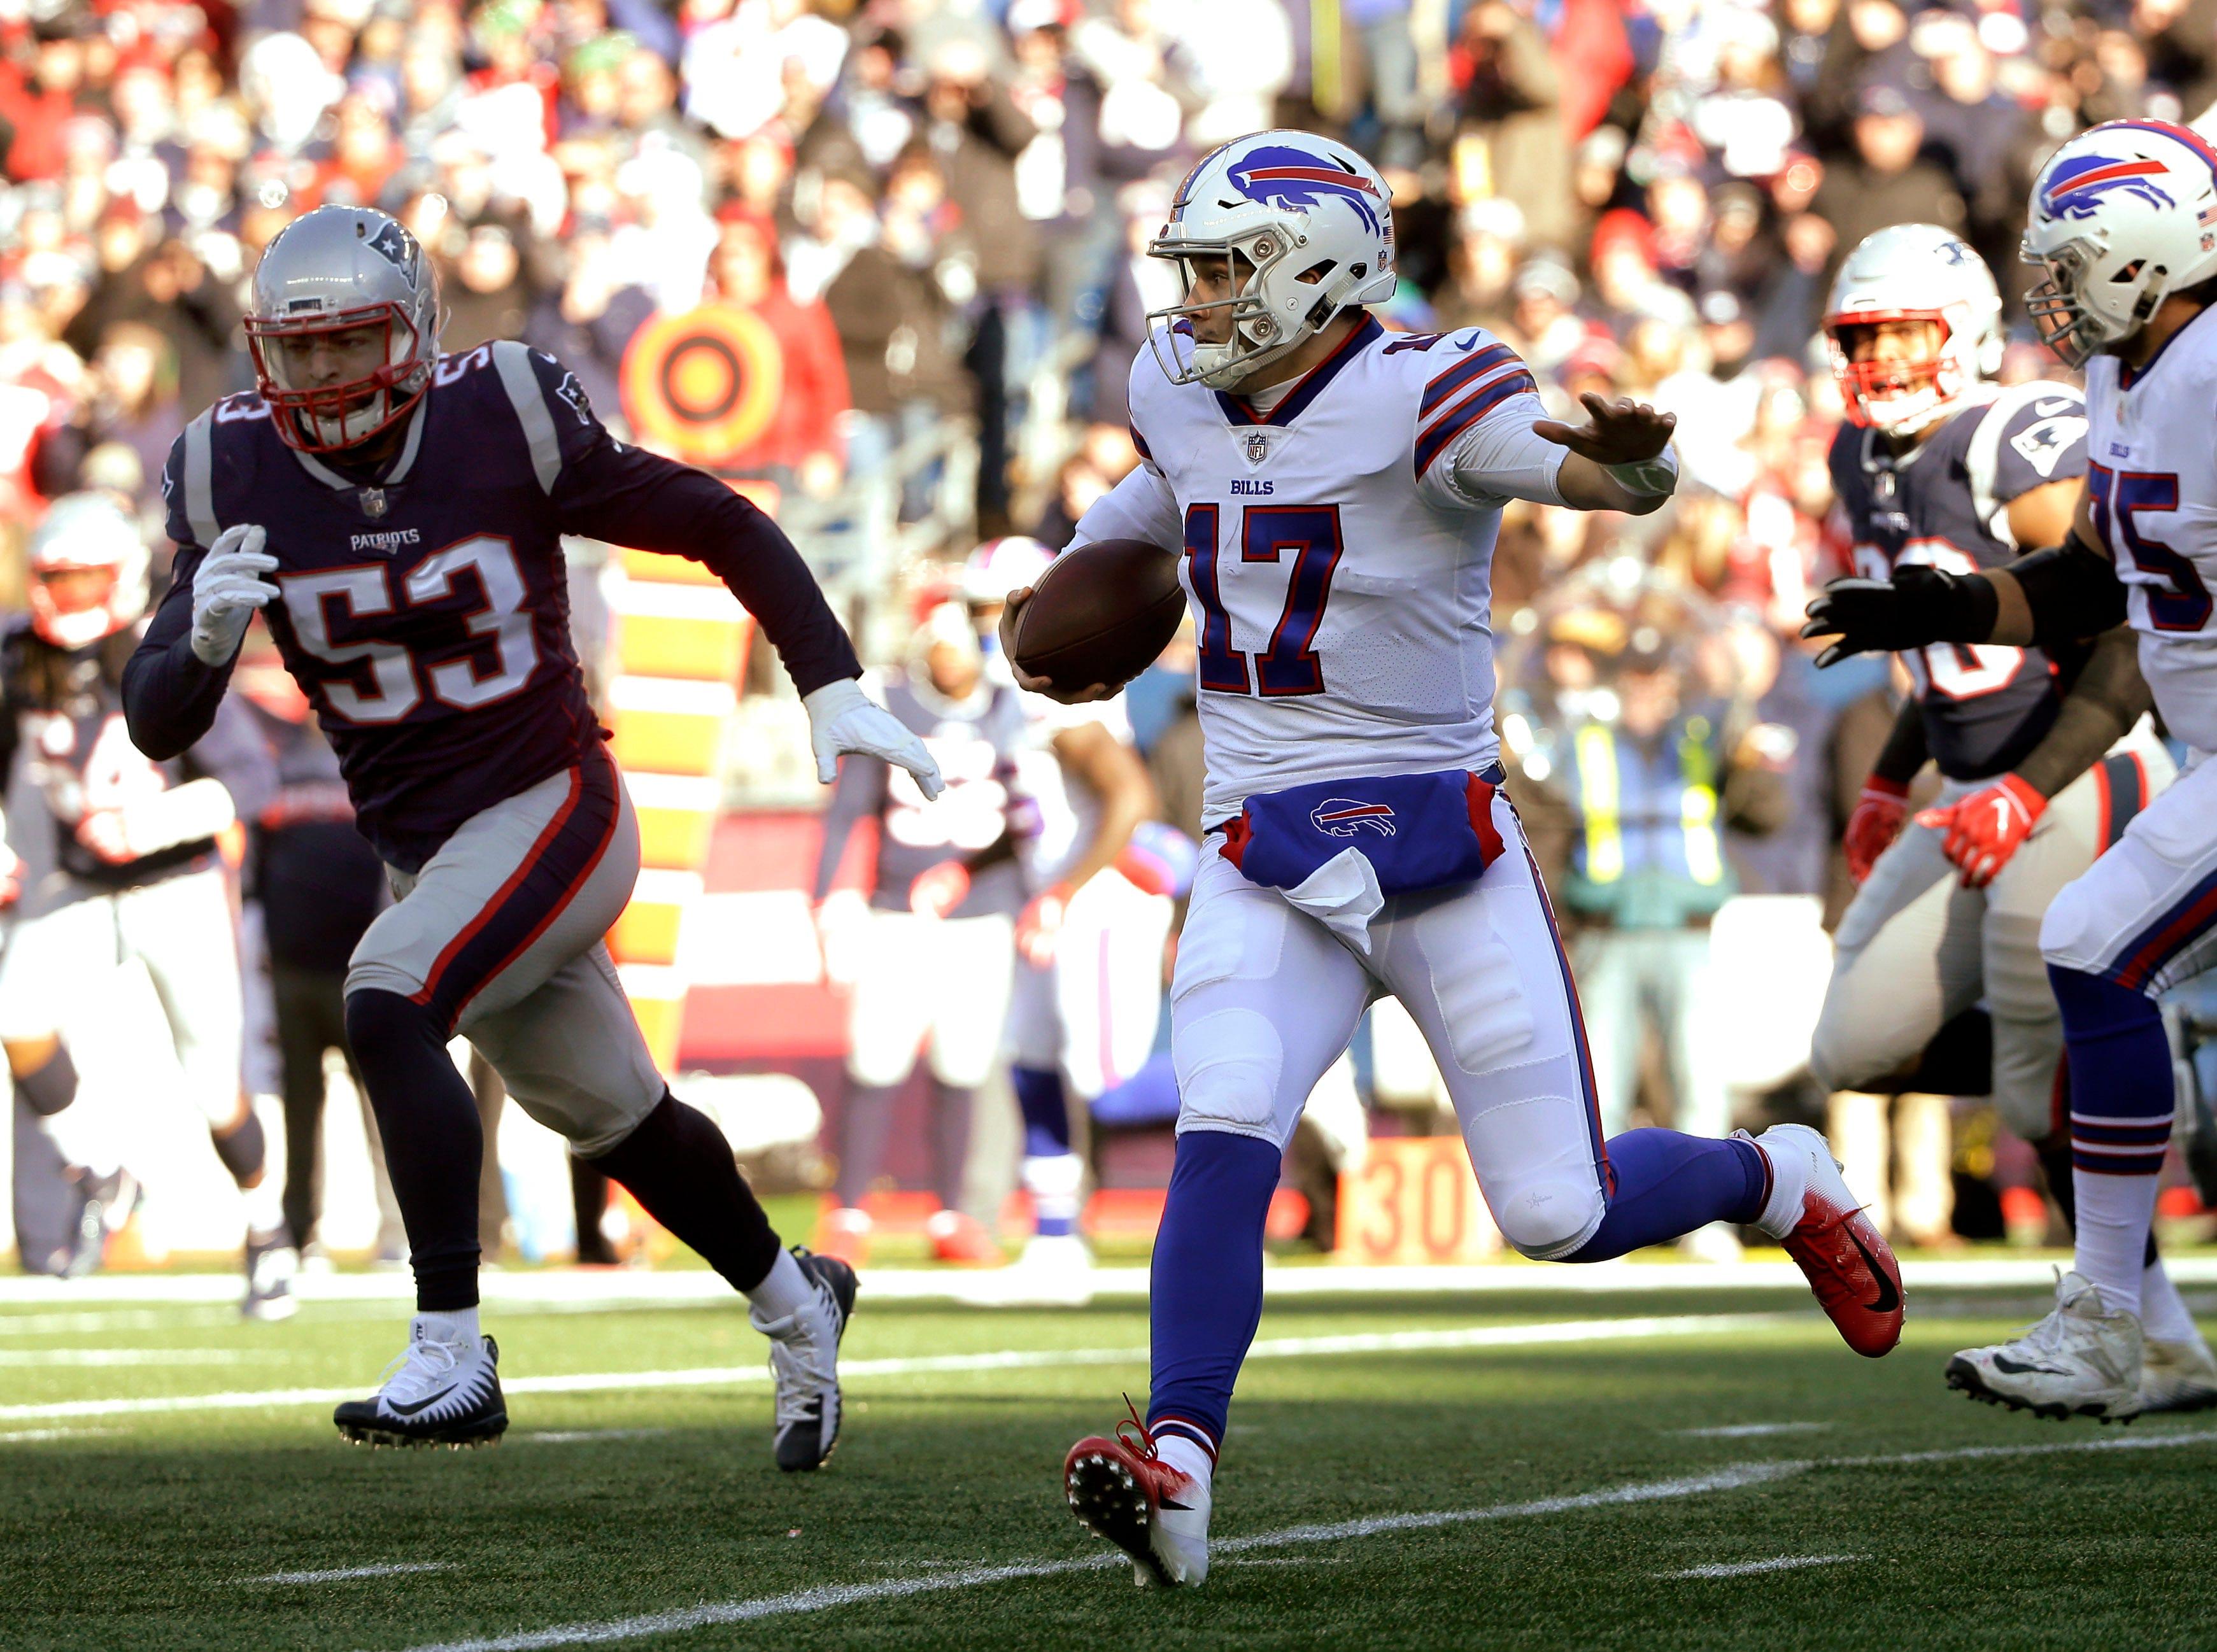 Buffalo Bills quarterback Josh Allen (17) runs from New England Patriots linebacker Kyle Van Noy (53) during the first half of an NFL football game, Sunday, Dec. 23, 2018, in Foxborough, Mass. (AP Photo/Steven Senne)